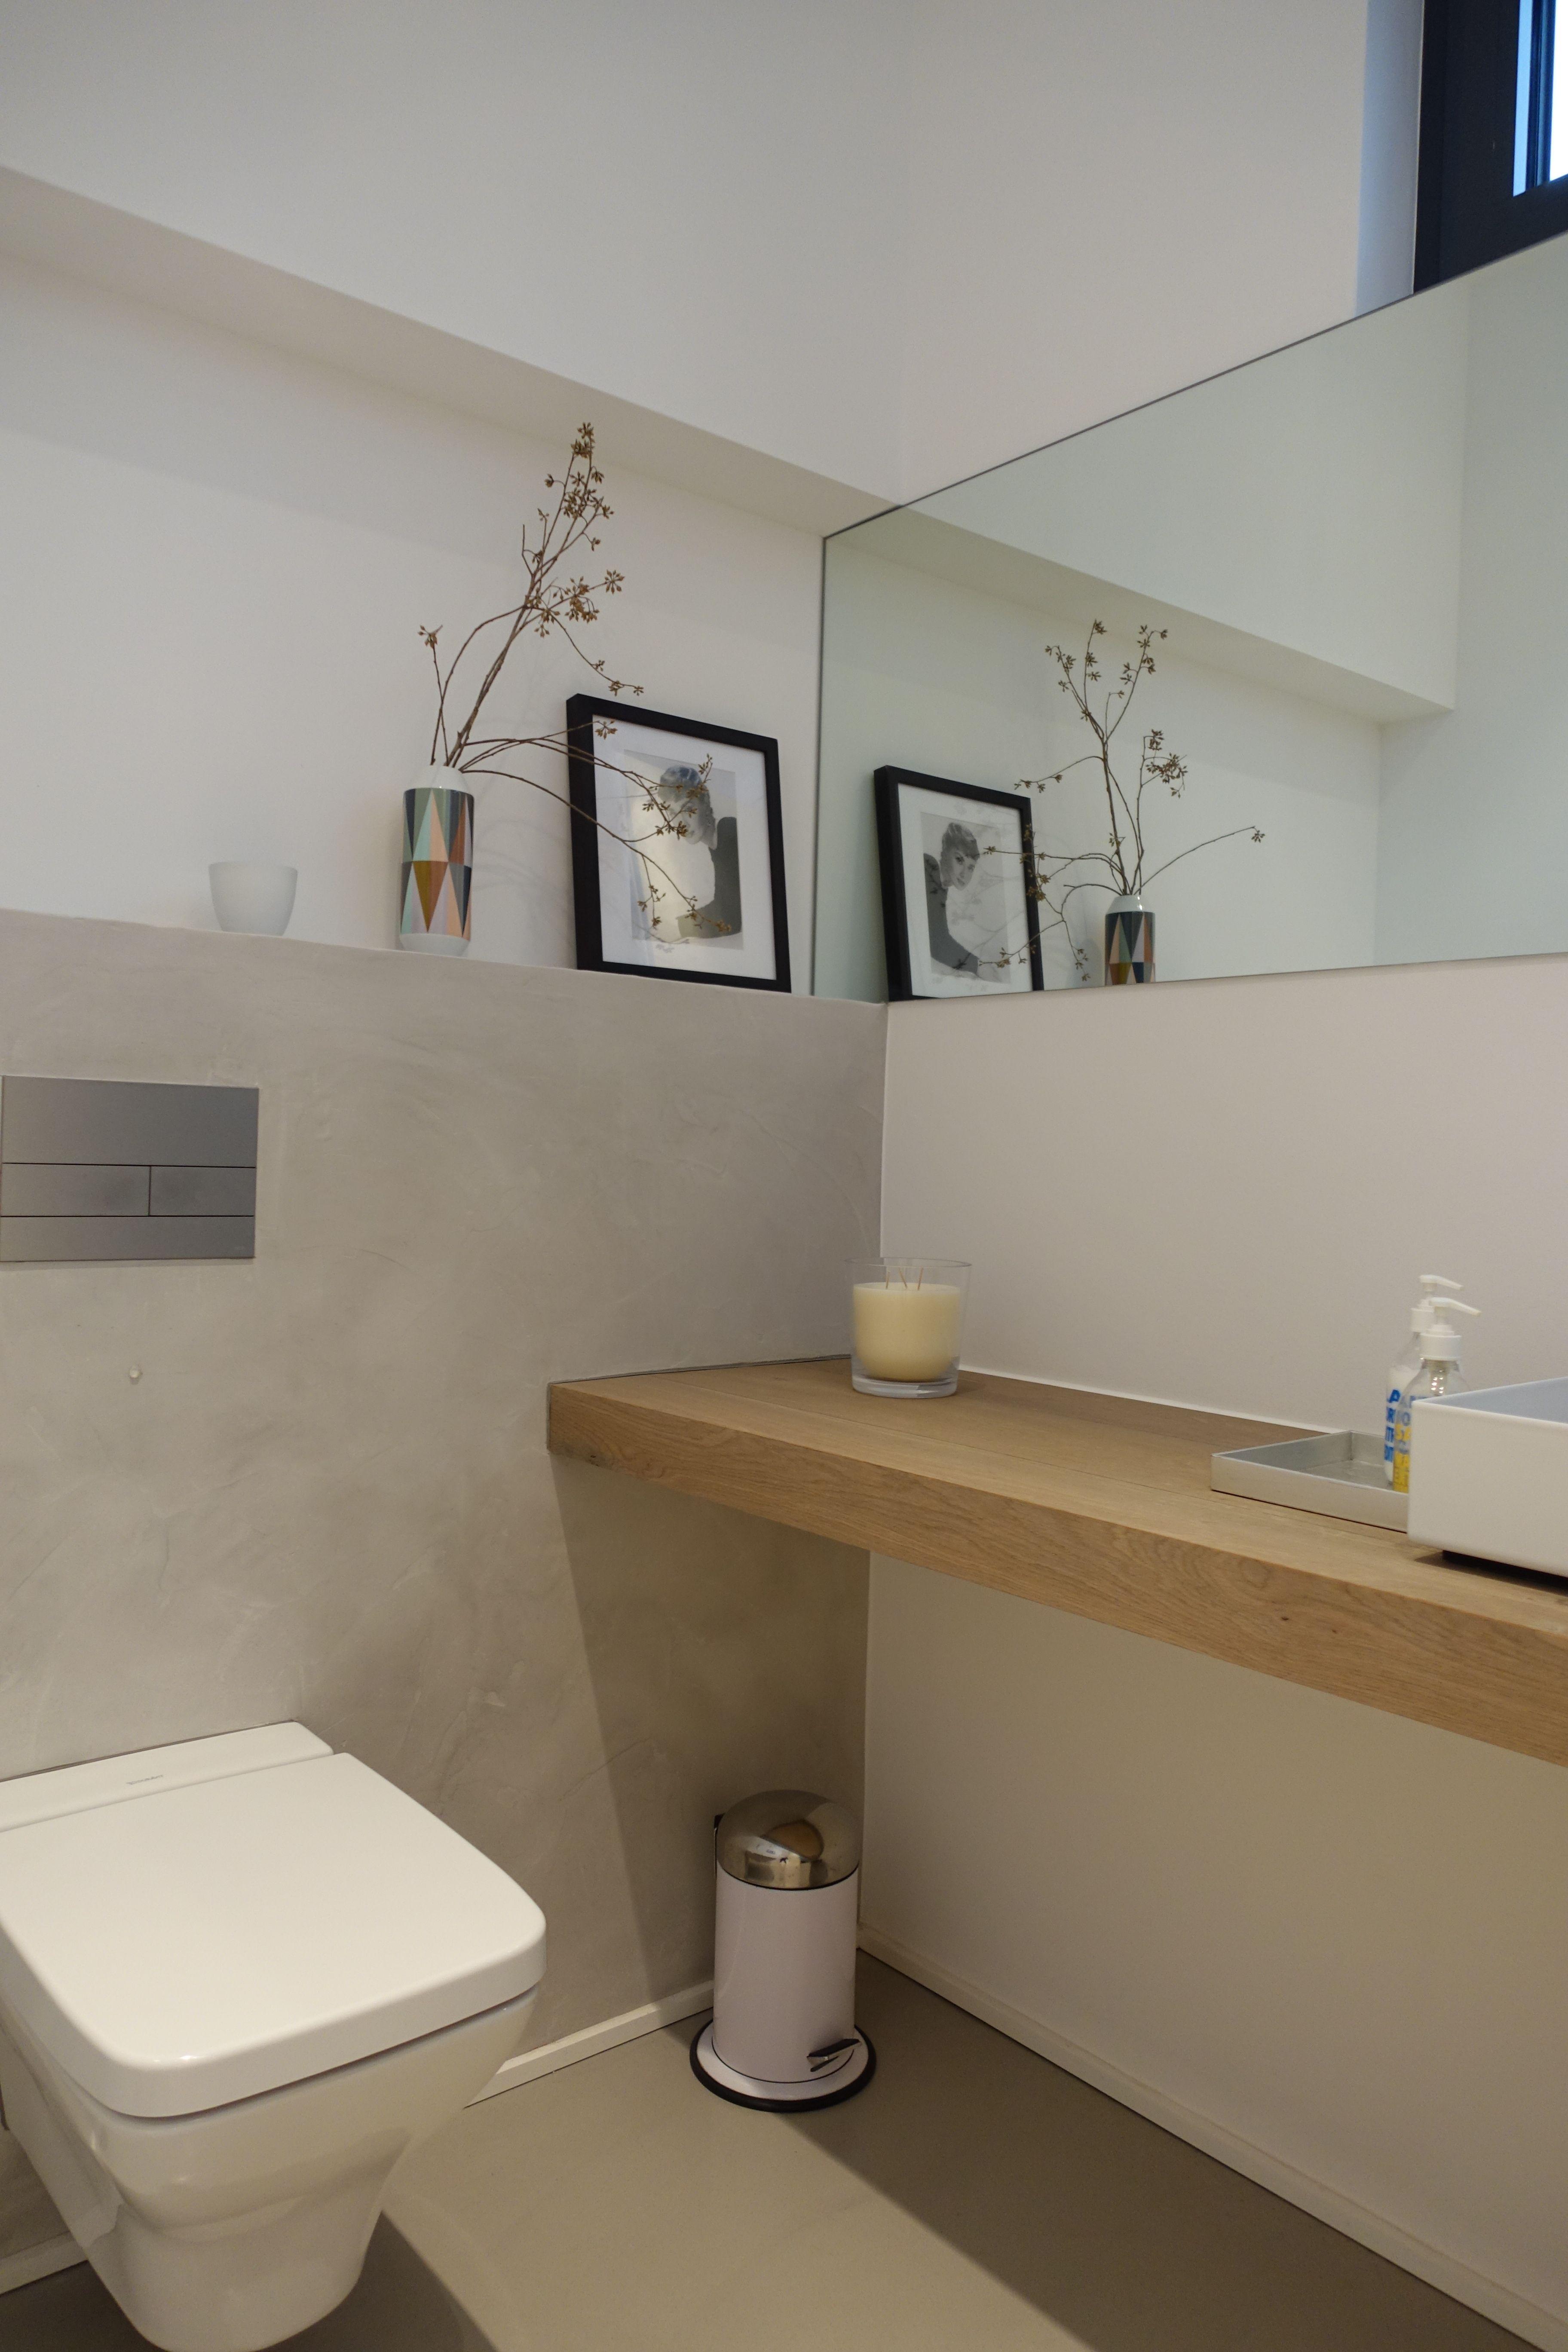 naturo konzept gmbh co kg i gr spachtelb den g ste wc pinterest badezimmer bad und. Black Bedroom Furniture Sets. Home Design Ideas